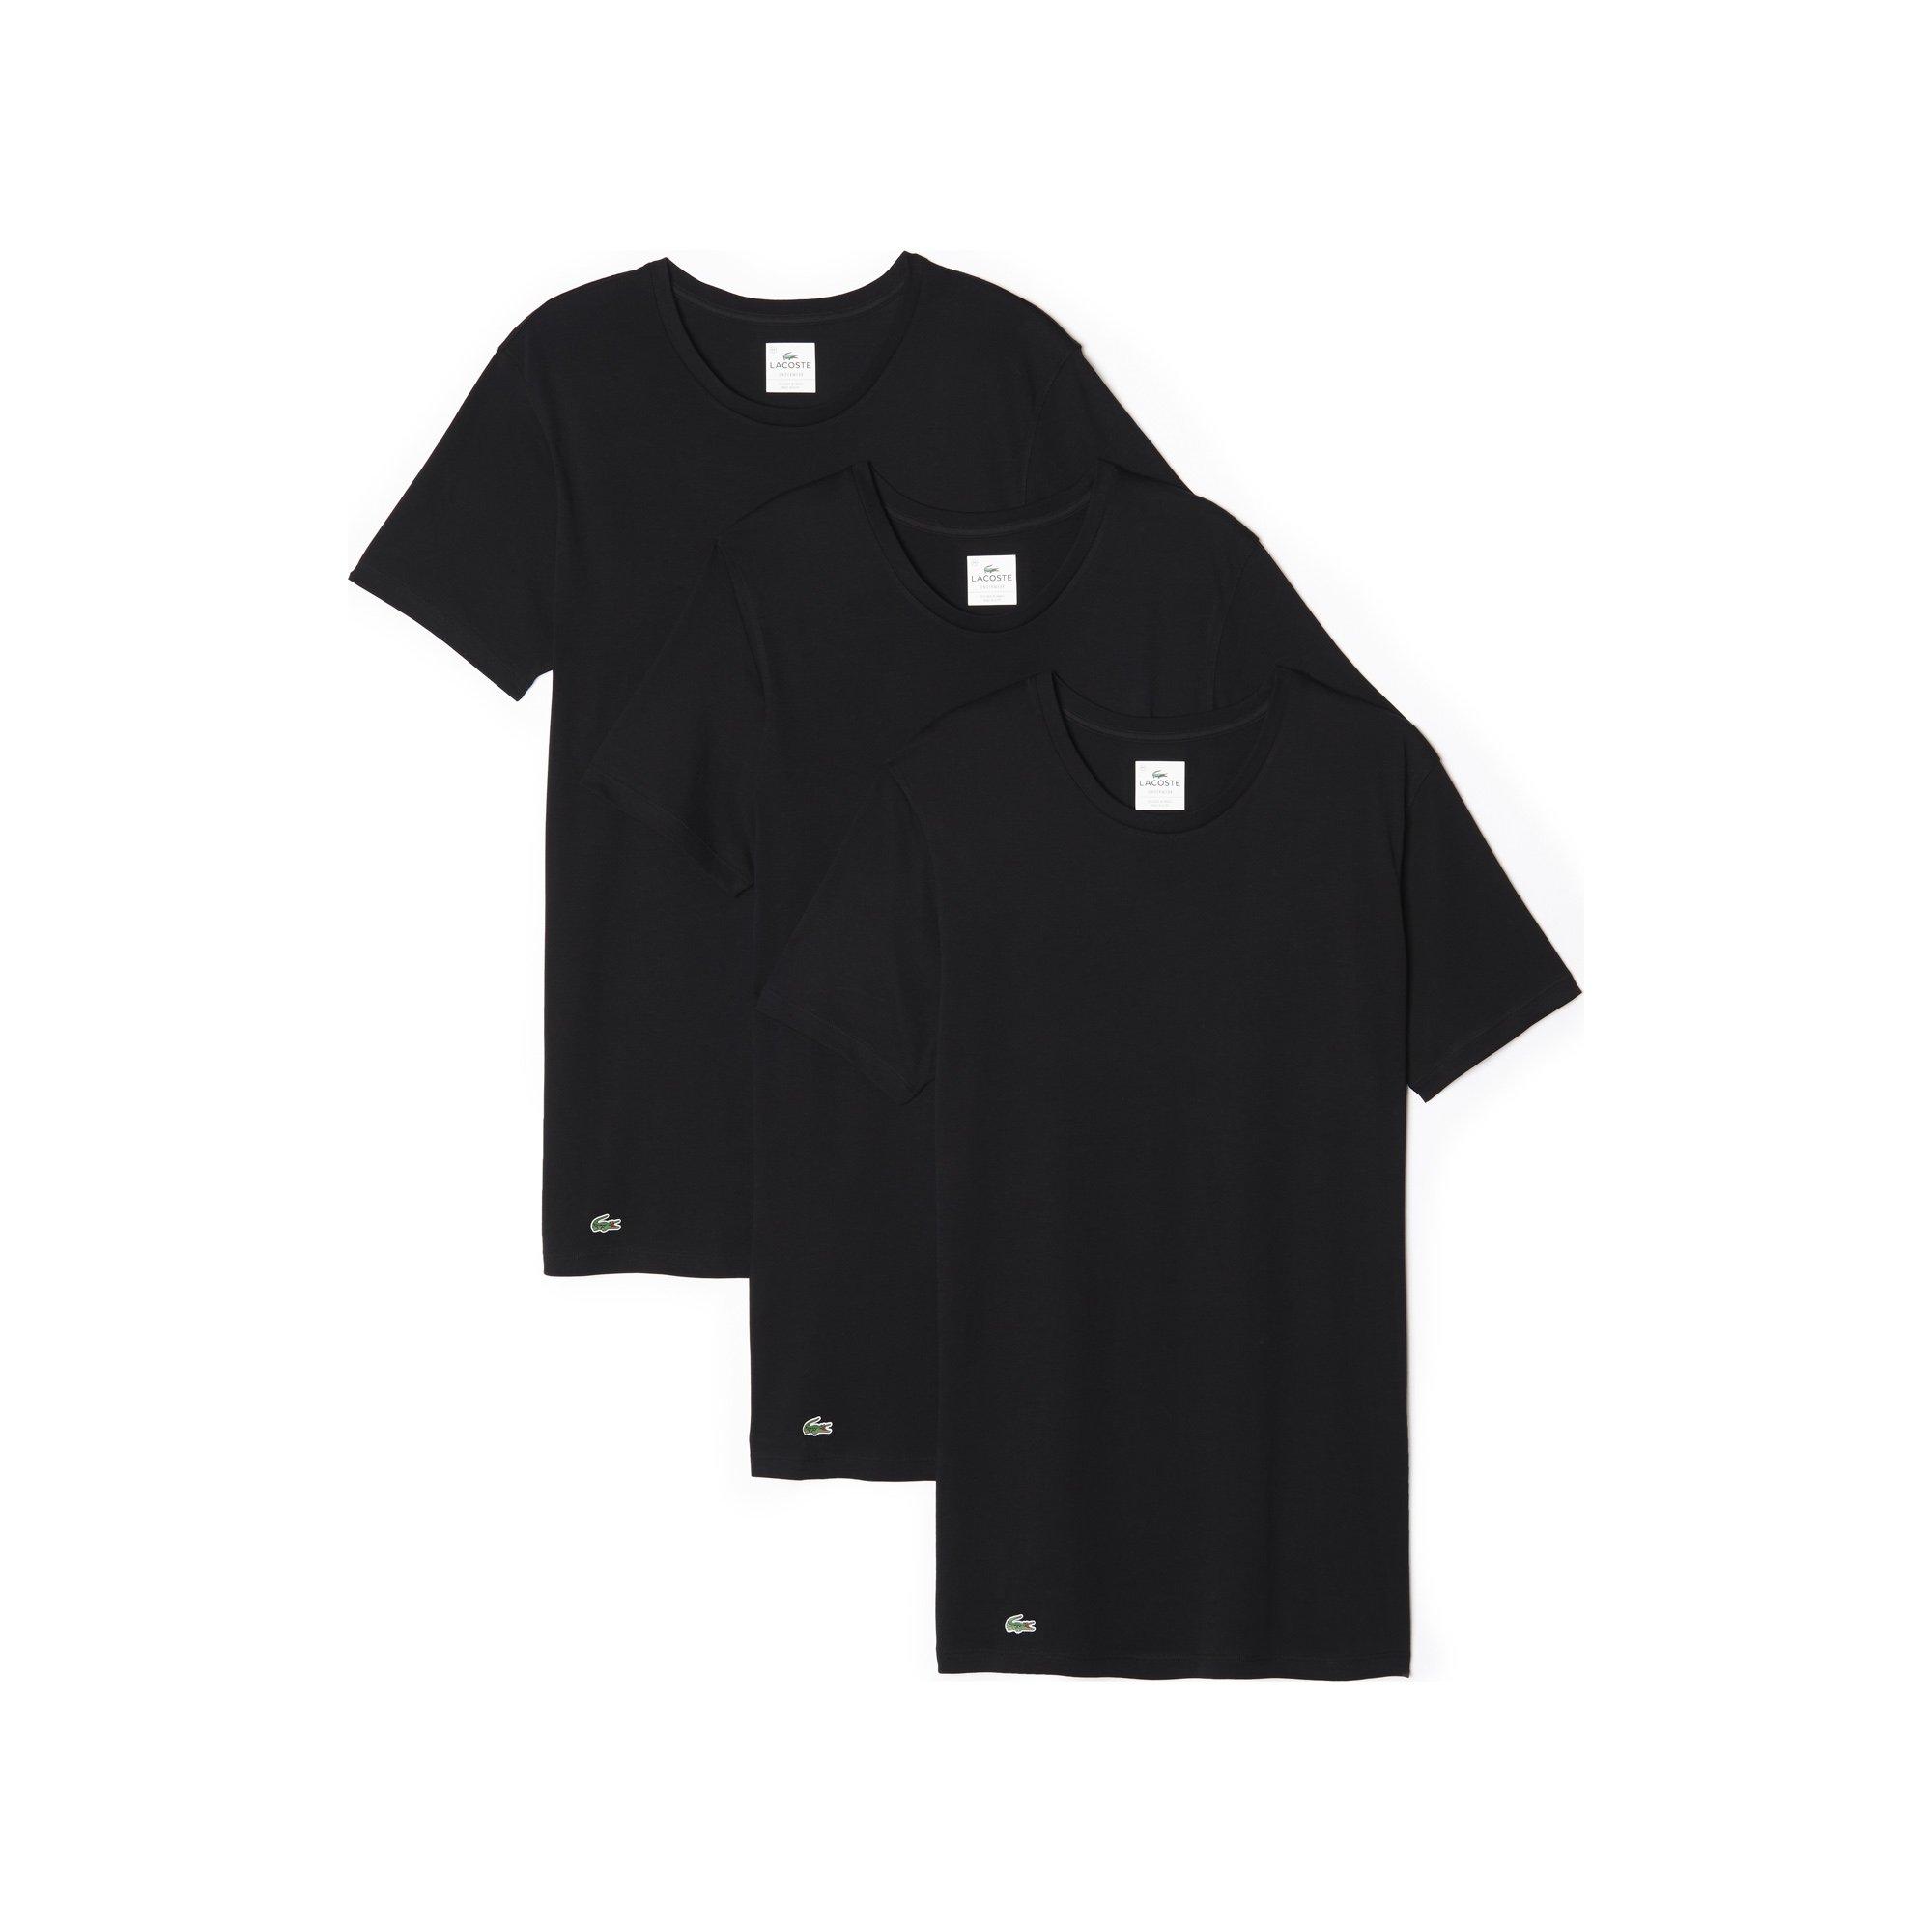 c67f8b67d5237 Galleon - Lacoste Men s Essentials Cotton Crew Neck T-Shirt